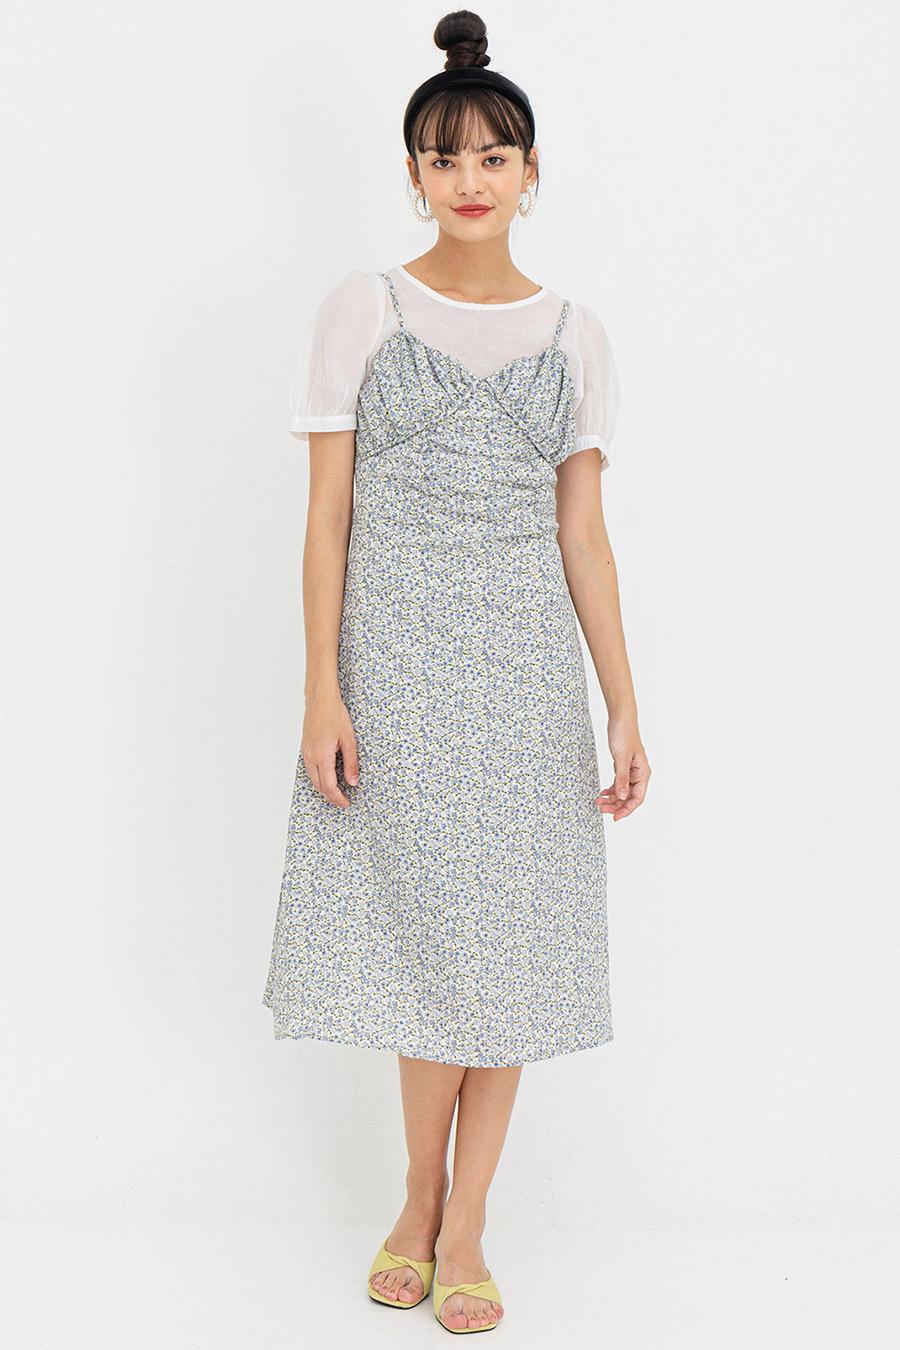 EVITA SET DRESS - BLEU FLEUR